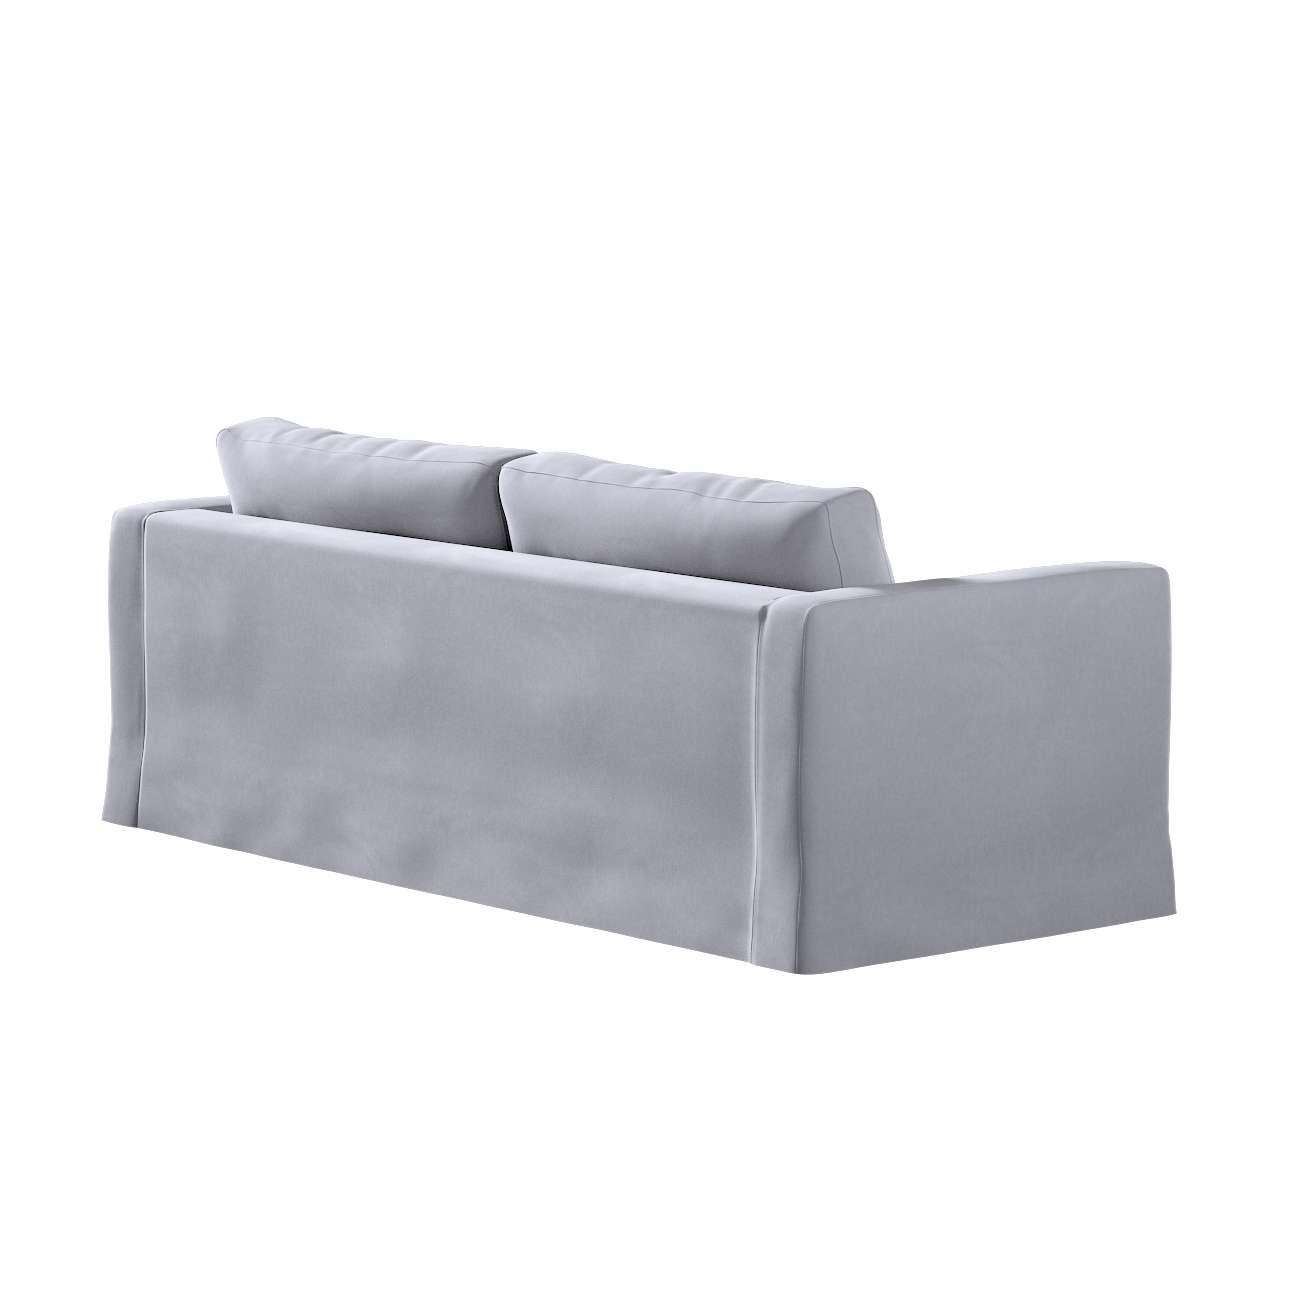 Floor length Karlstad 3-seater sofa cover in collection Velvet, fabric: 704-24